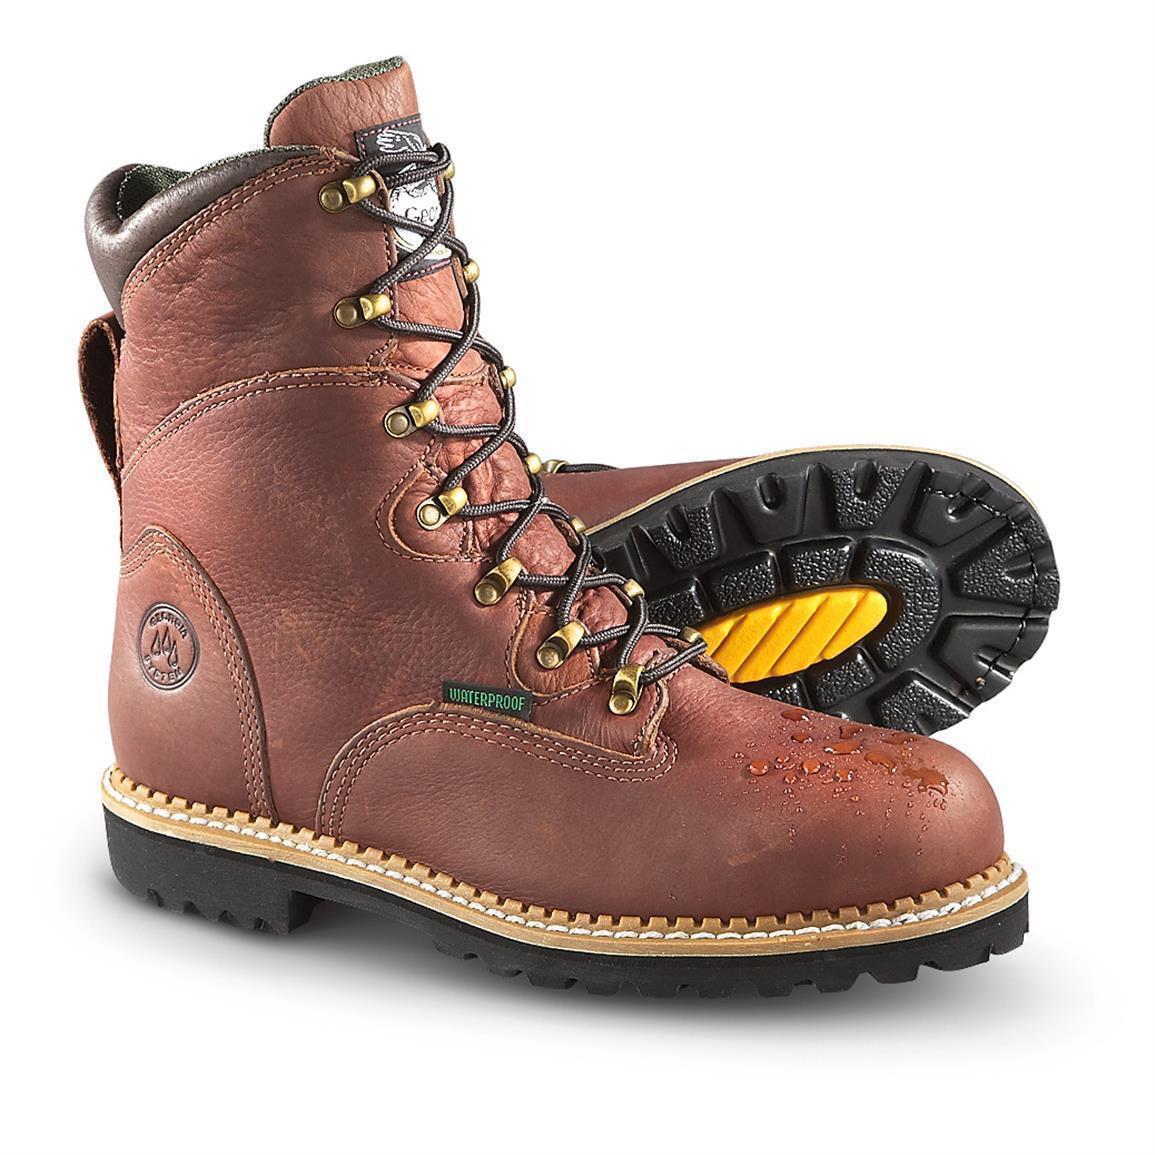 Georgia Boot Men's Steel Toe Waterproof Hammer Work Boots Size UK12 - EU 47